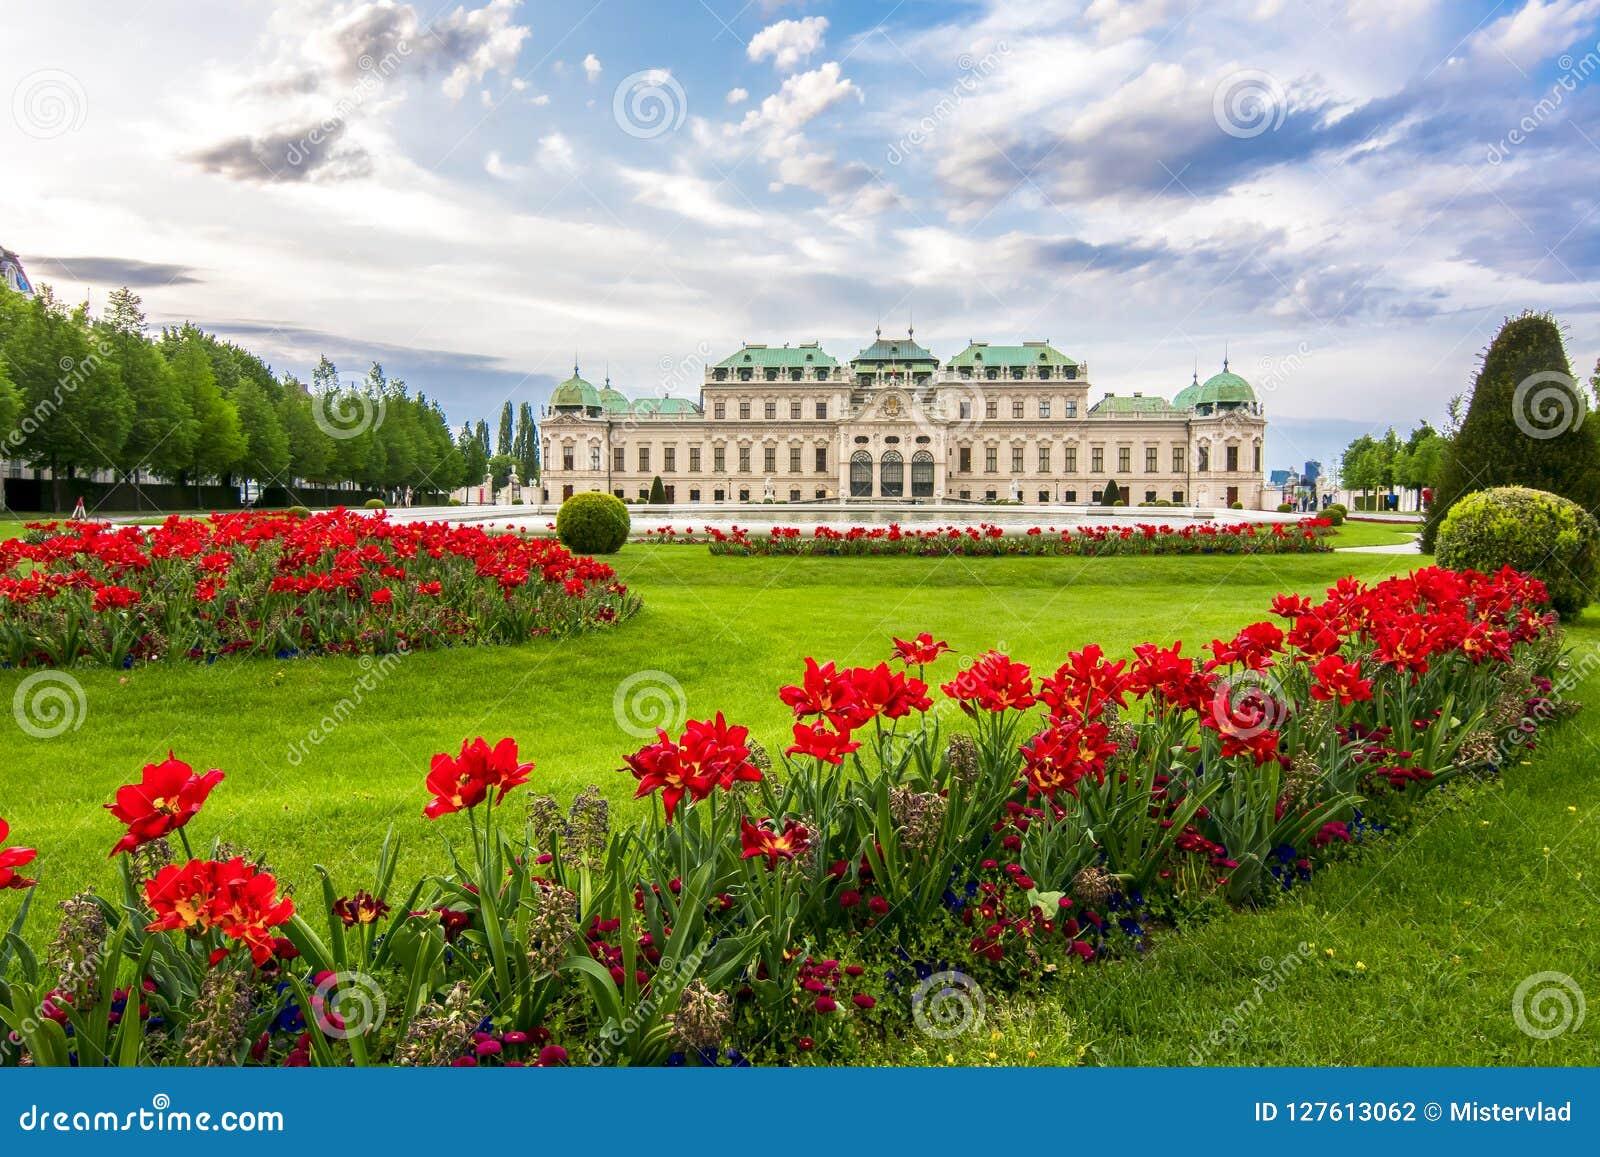 Palácio superior do Belvedere, Viena, Áustria